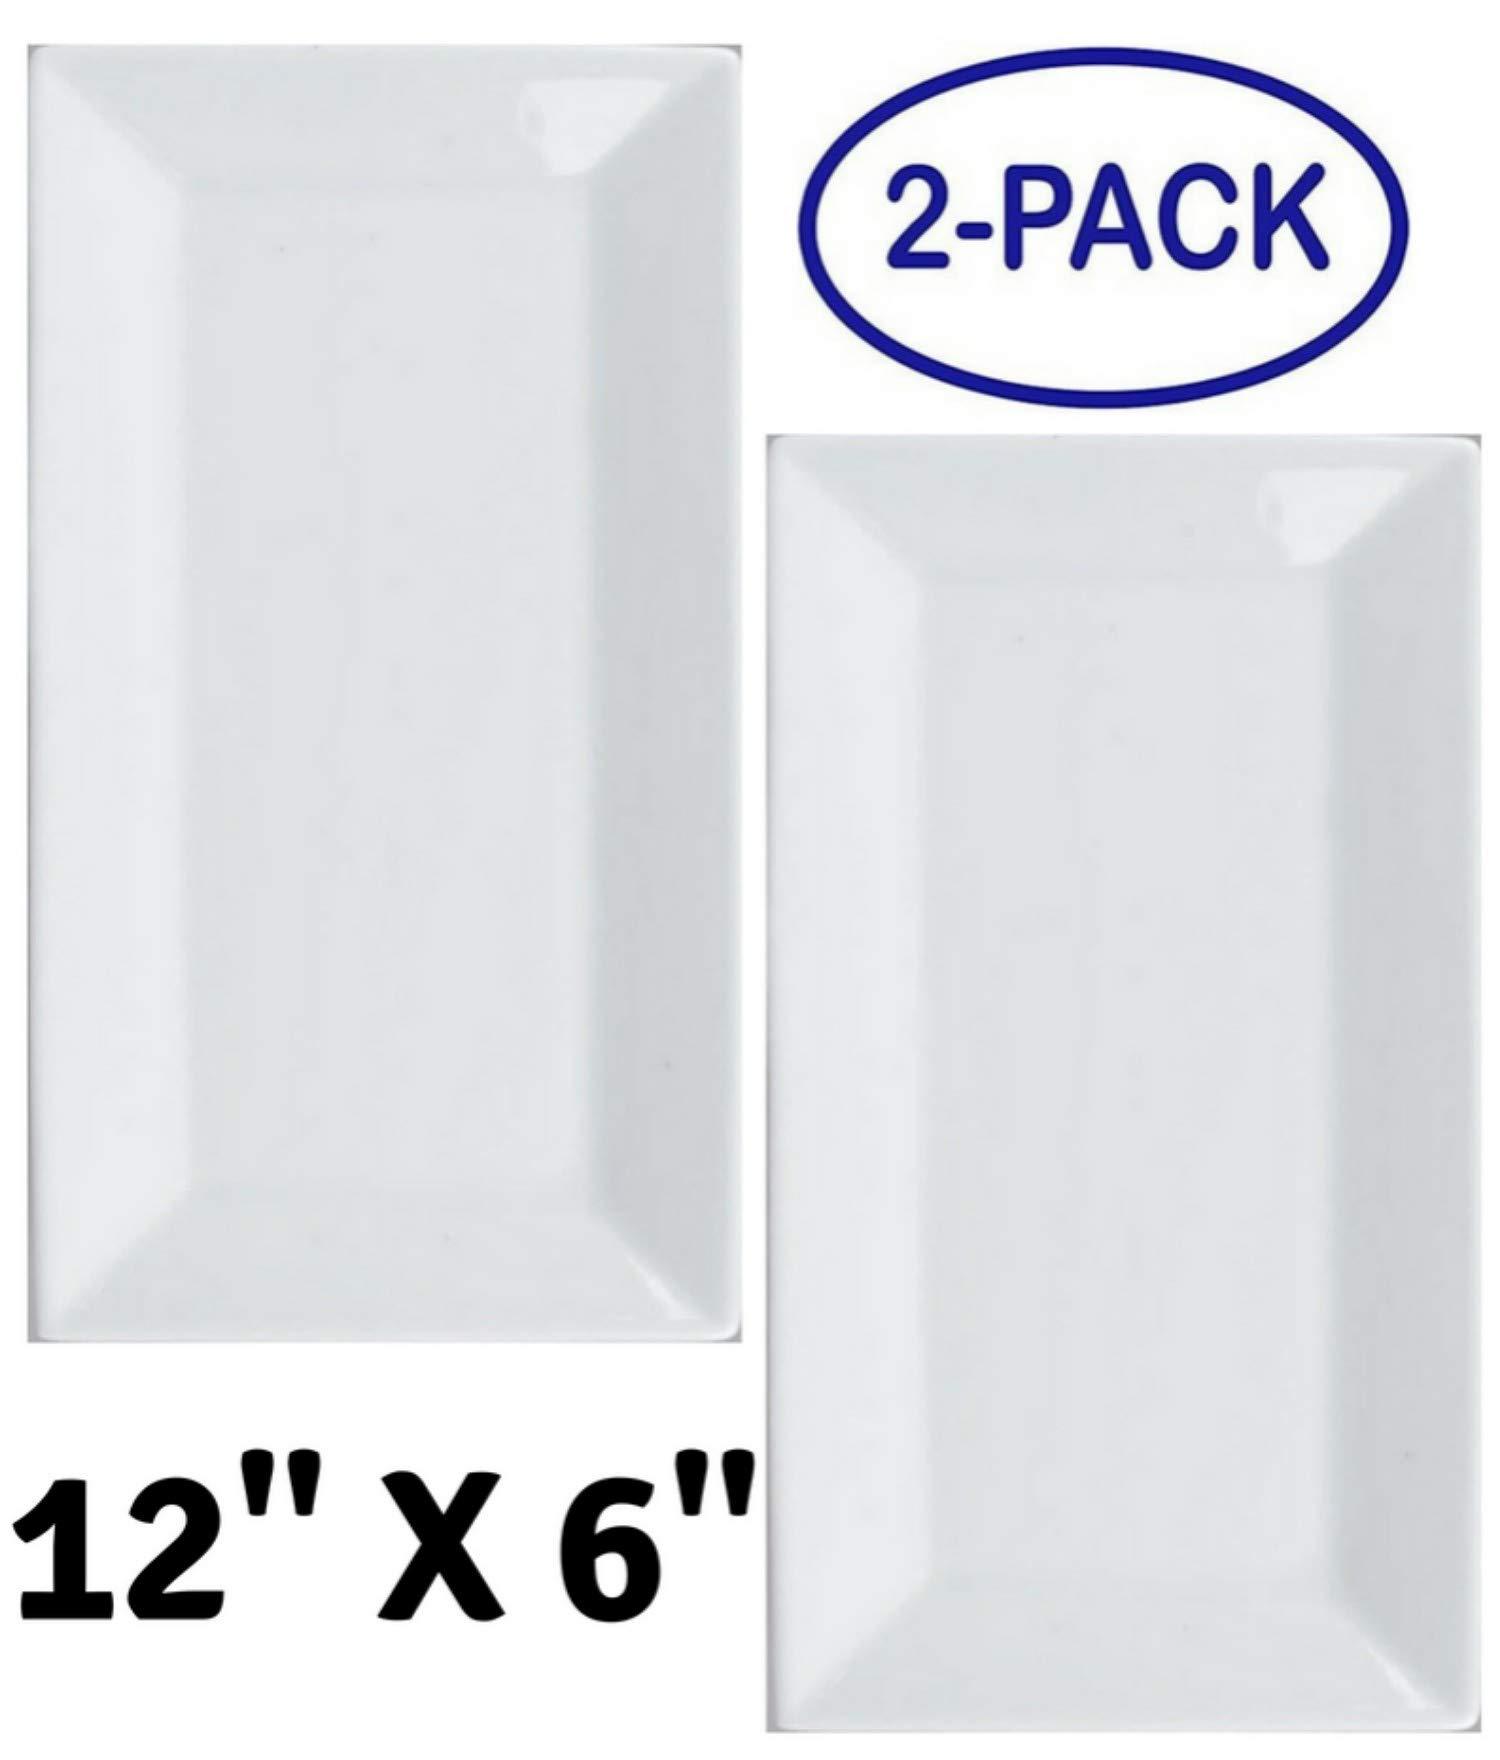 White 12'' x 6'' Rectangular Porcelain Platter - Party Food Server Display Plate - Cake Dessert Fruit Presentation Tray